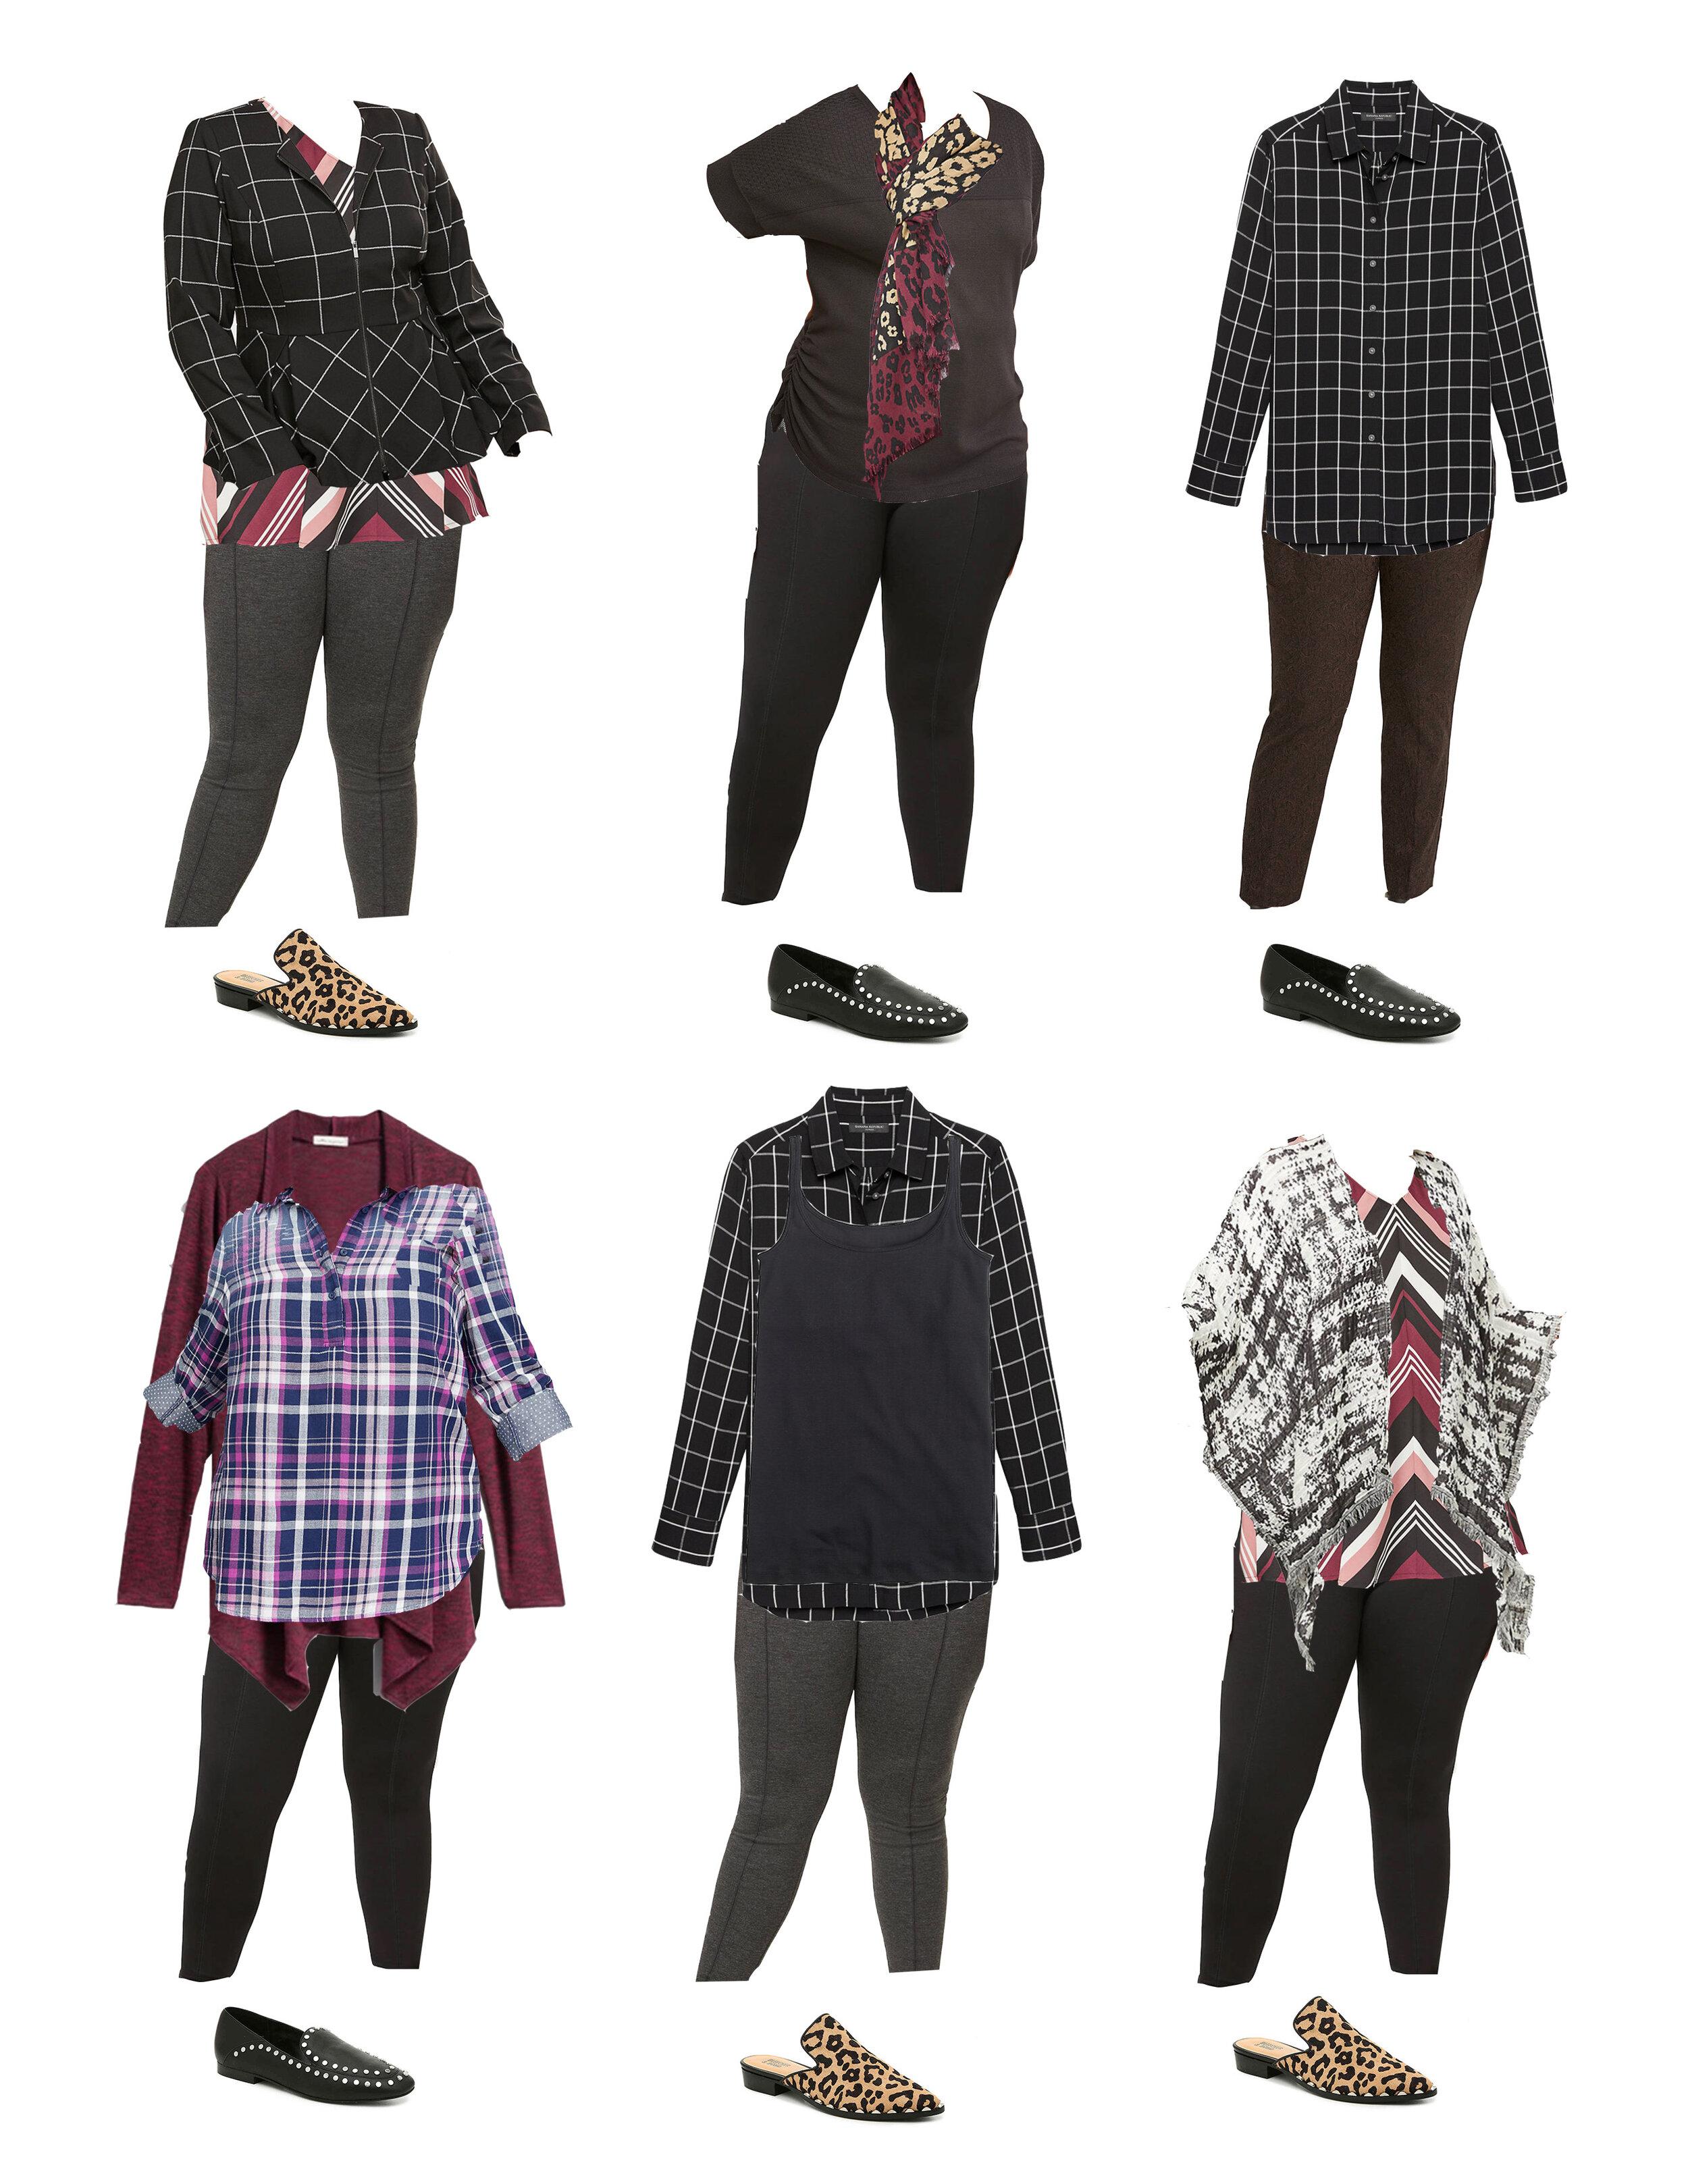 Jenna's Outfits 2.jpg